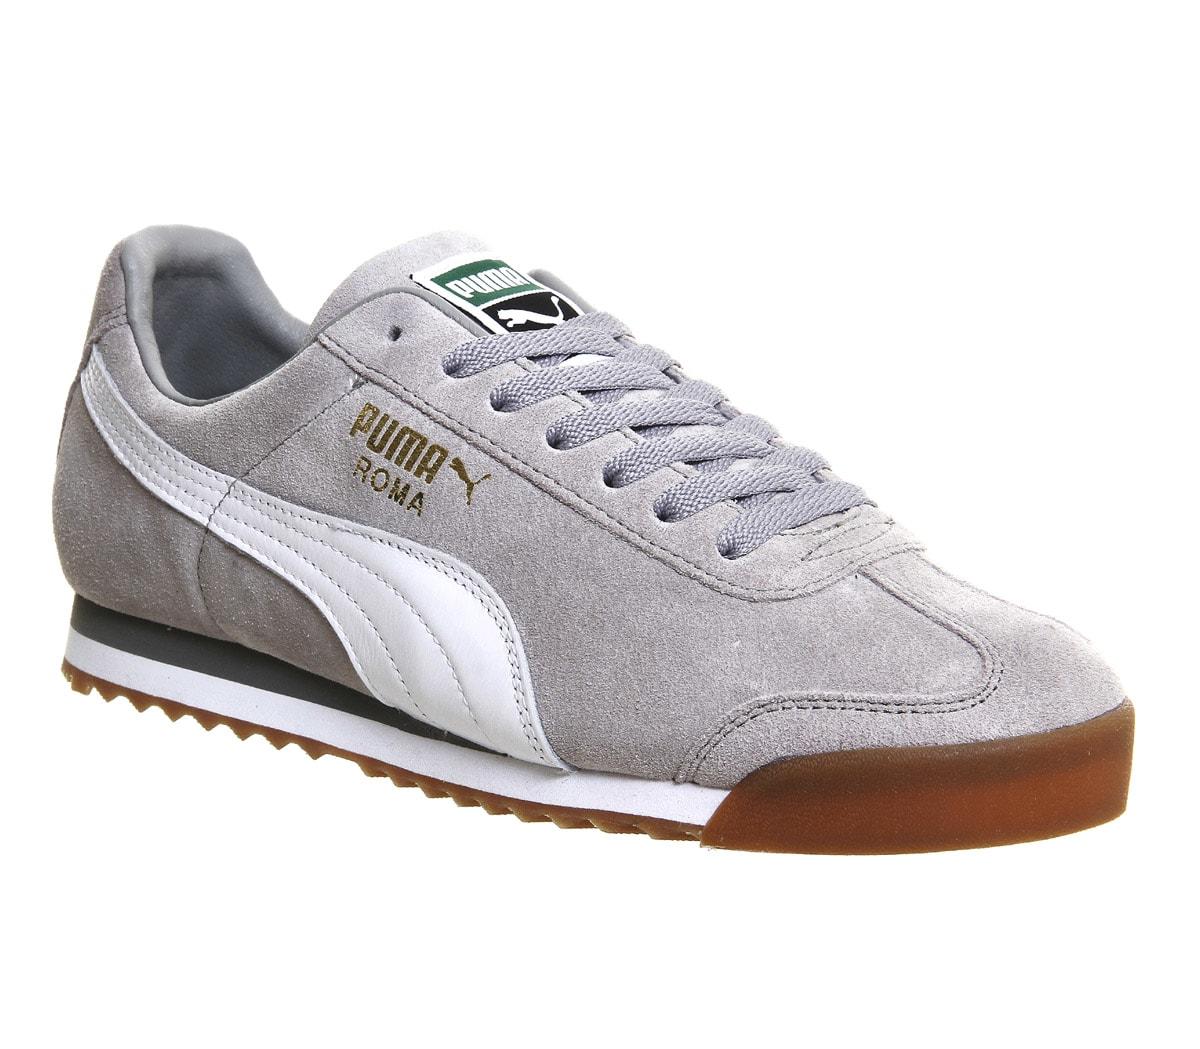 puma roma shoes singapore